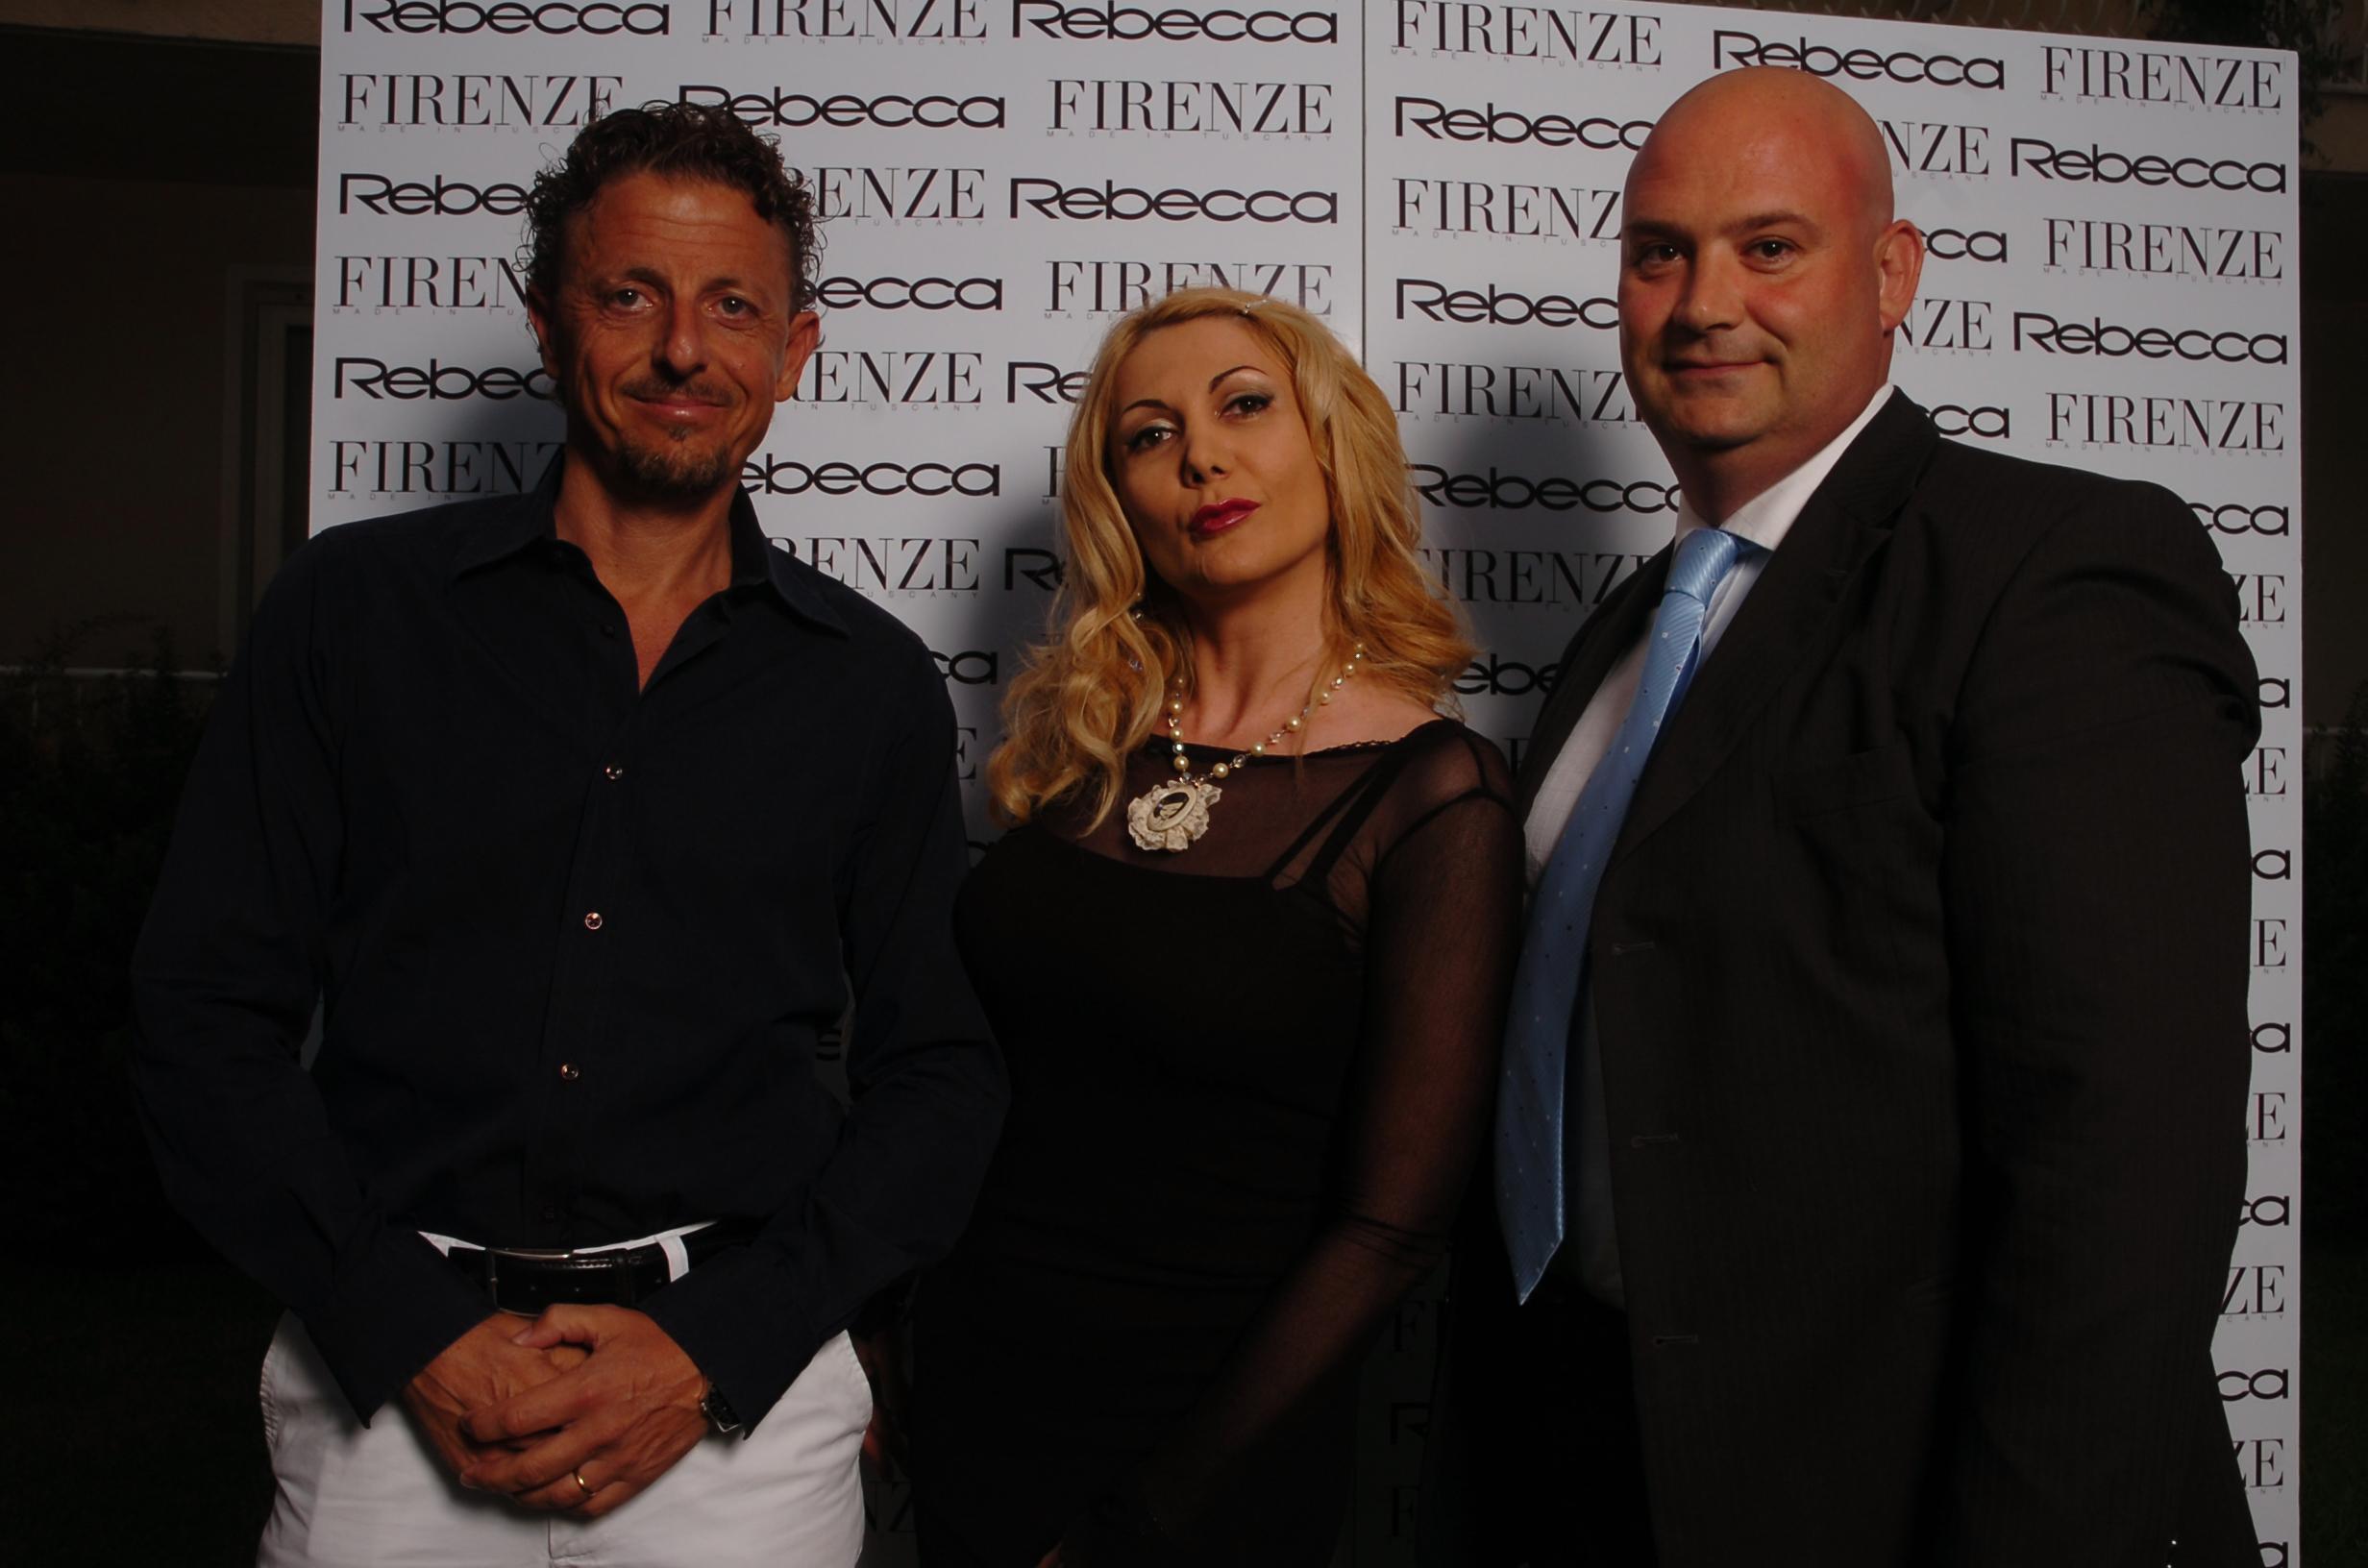 Paolo Marcheschi, Daniela Patrascanu, Roberto Tesi